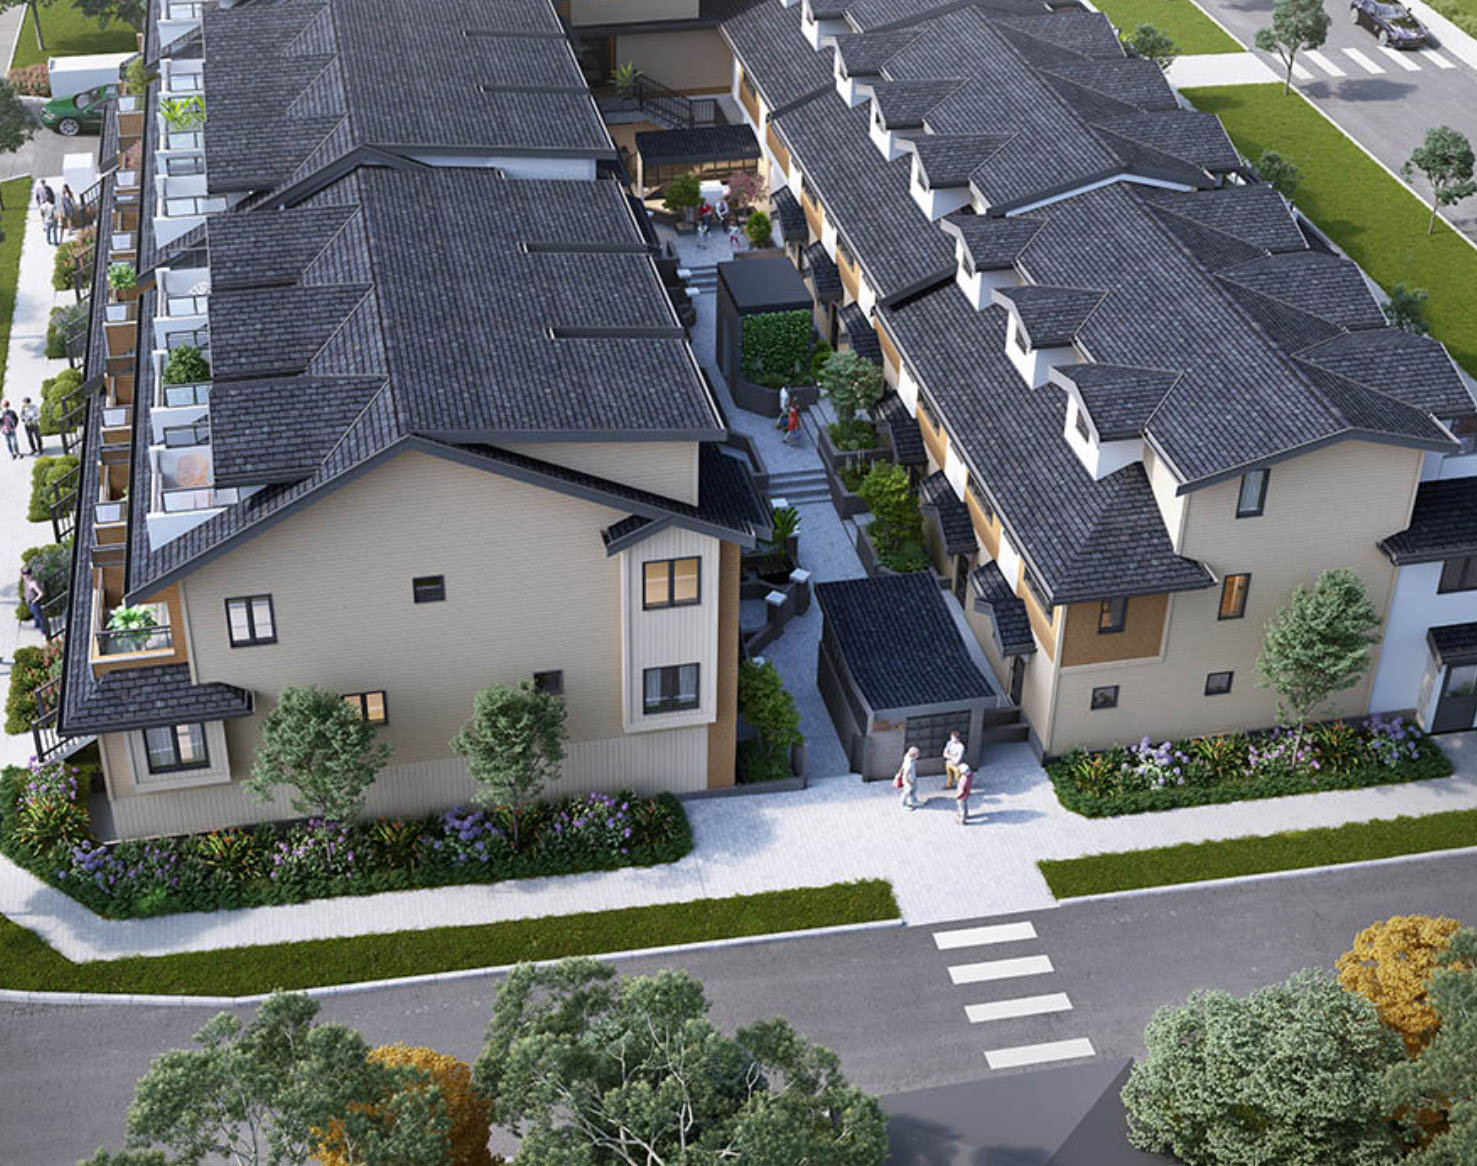 Rae Garden - 3601 Rae Ave - Development by Rosanni Properties !